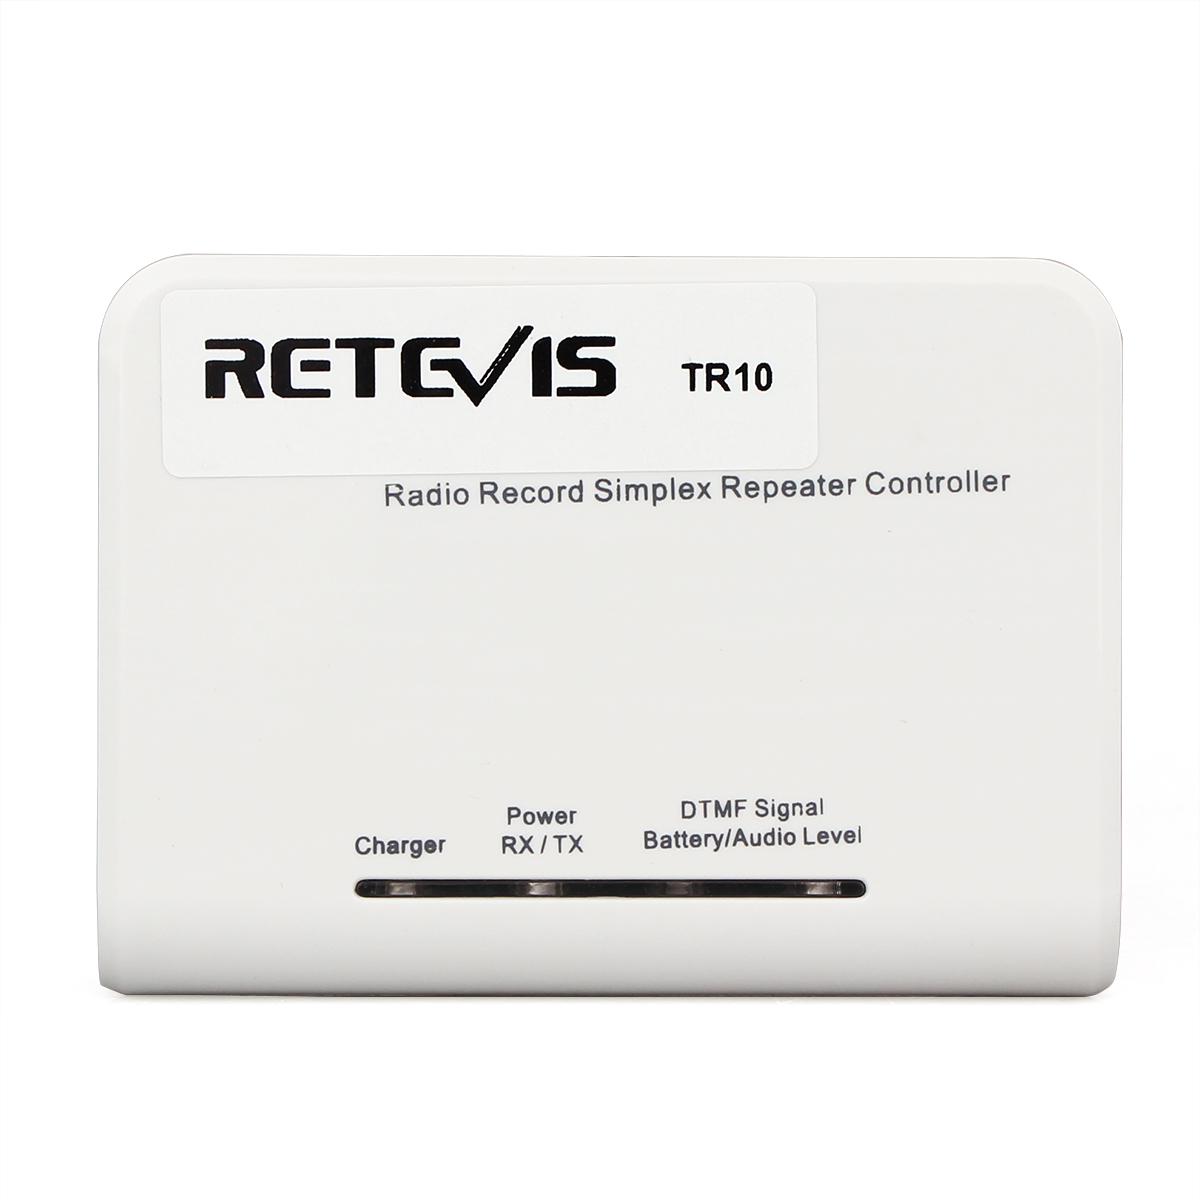 Retevis Tr10 Simplex Repeater Controller Dtmf Signal Display For Ham Radio Remote Control Using Receiver Transceiver 2way